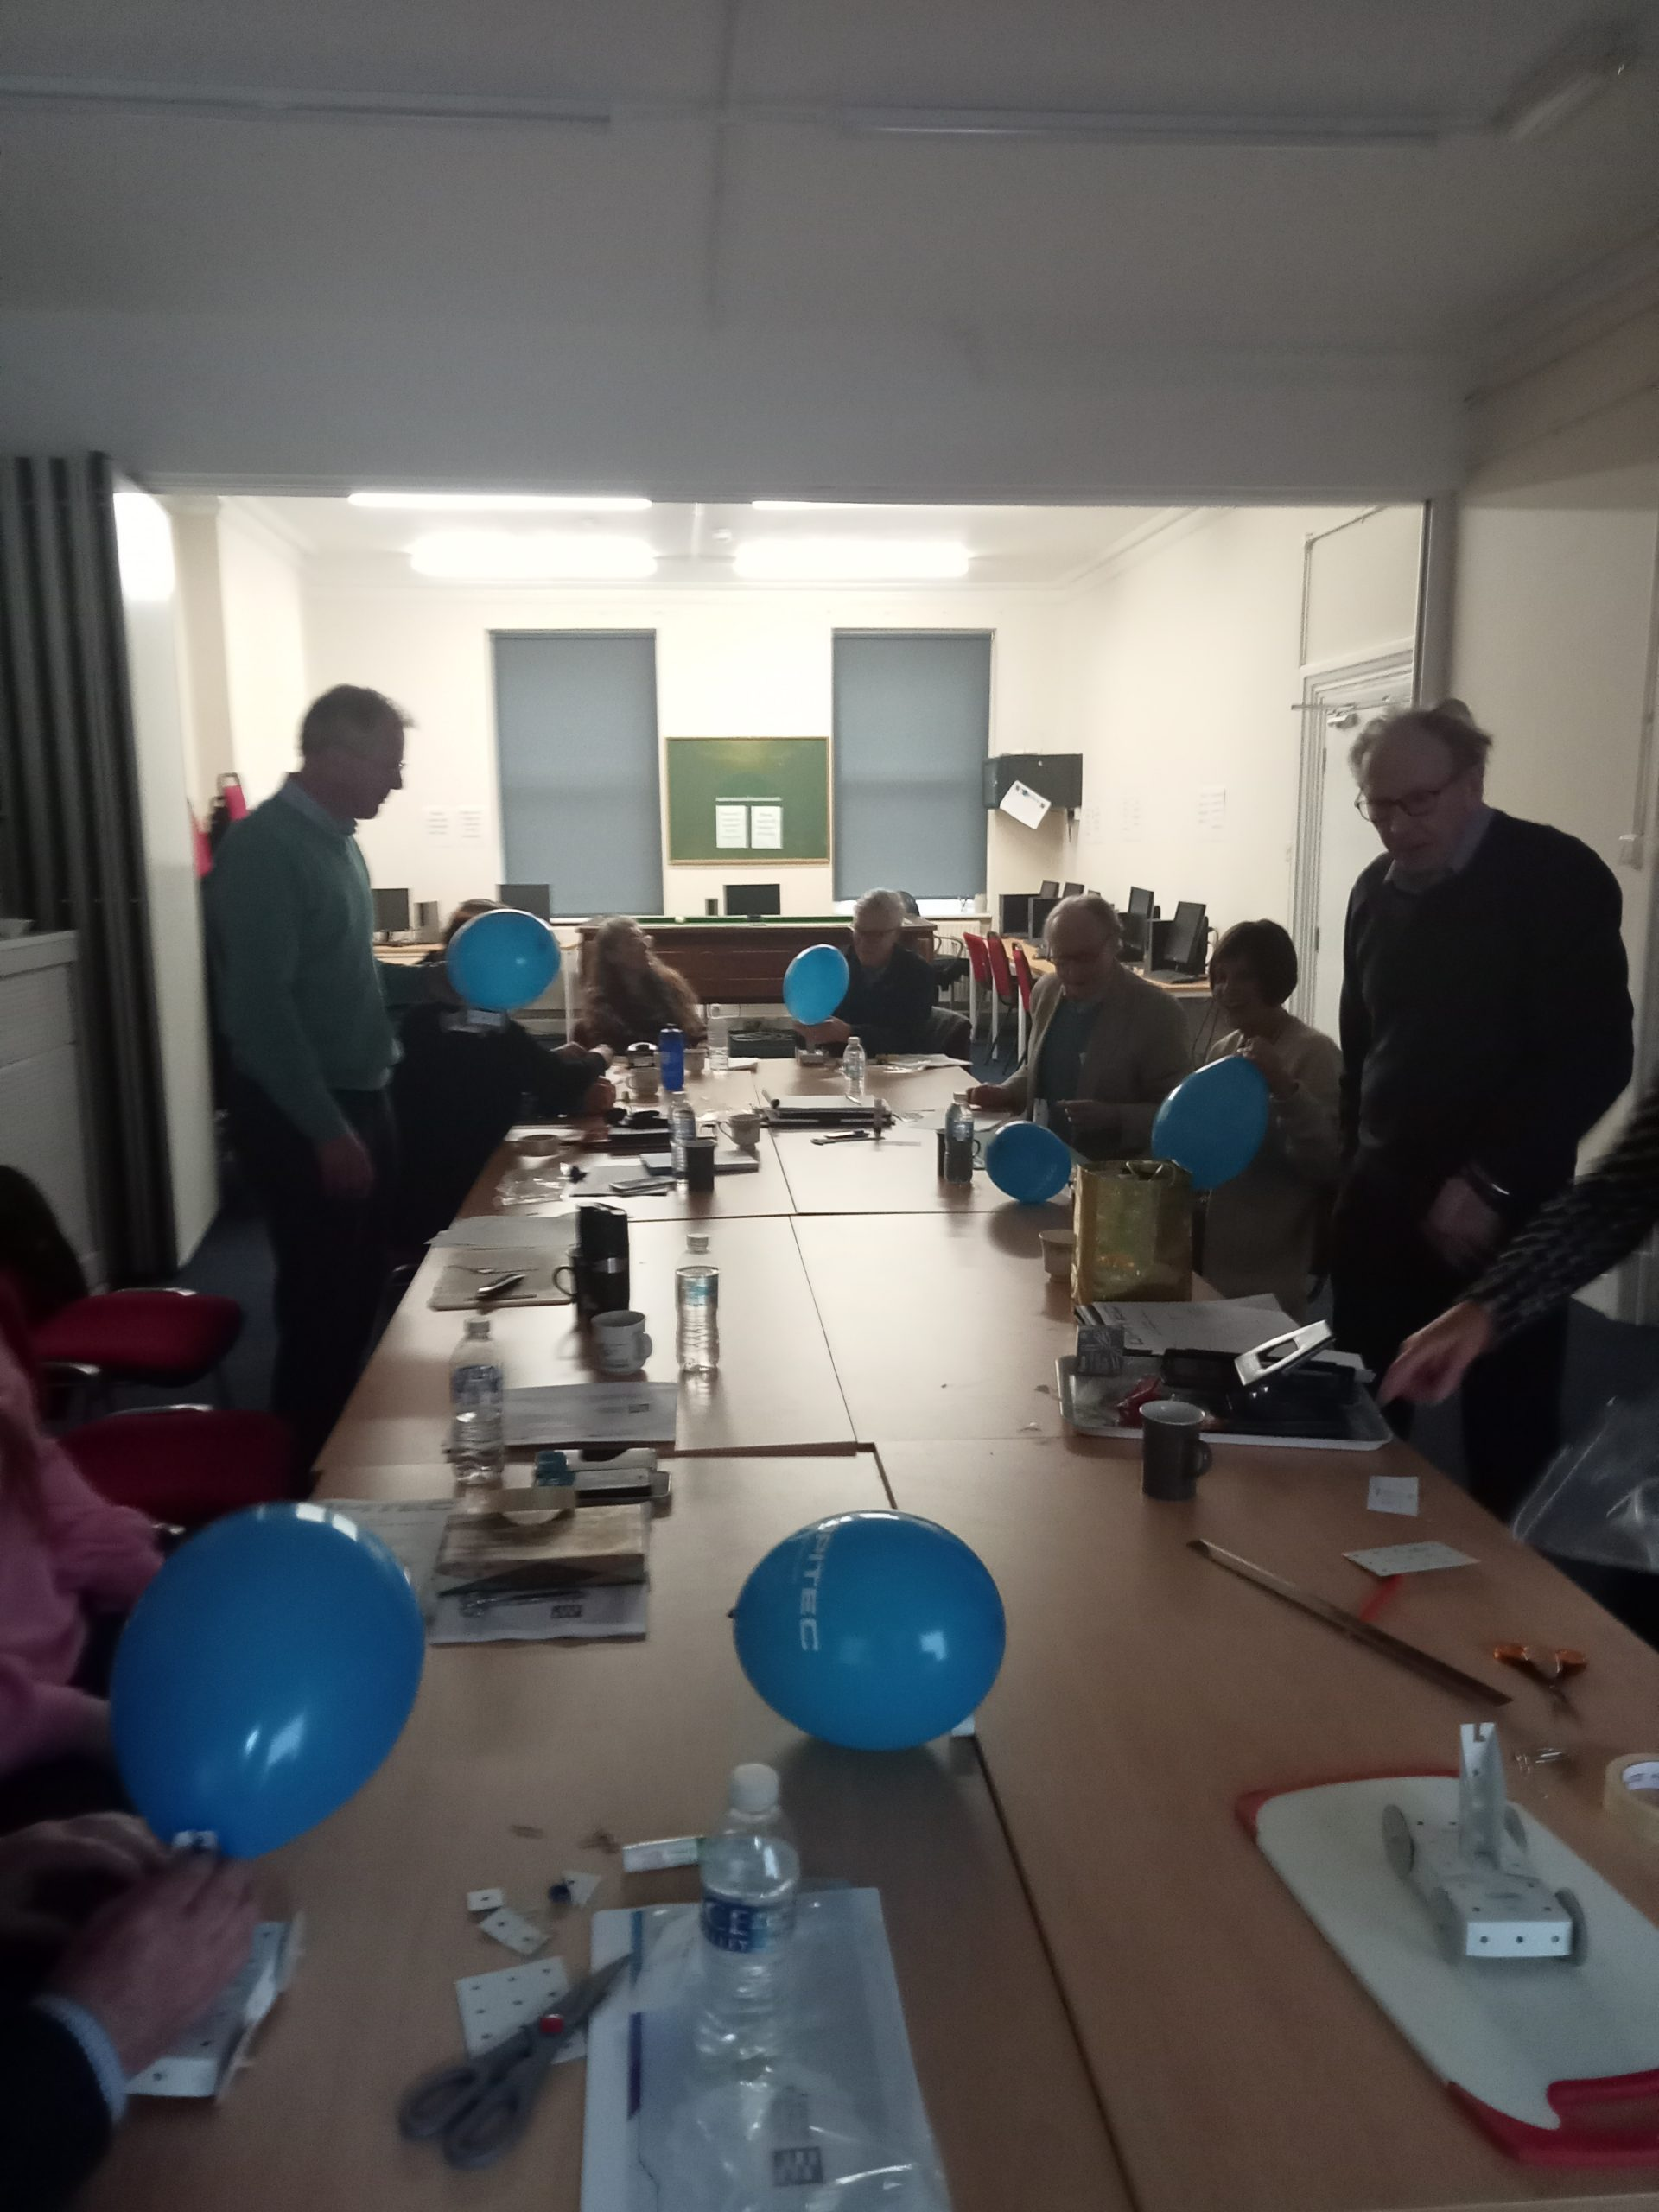 Volunteer Hertfordshire, Volunteer near me, Volunteer at a prison, How to become a Volunteer